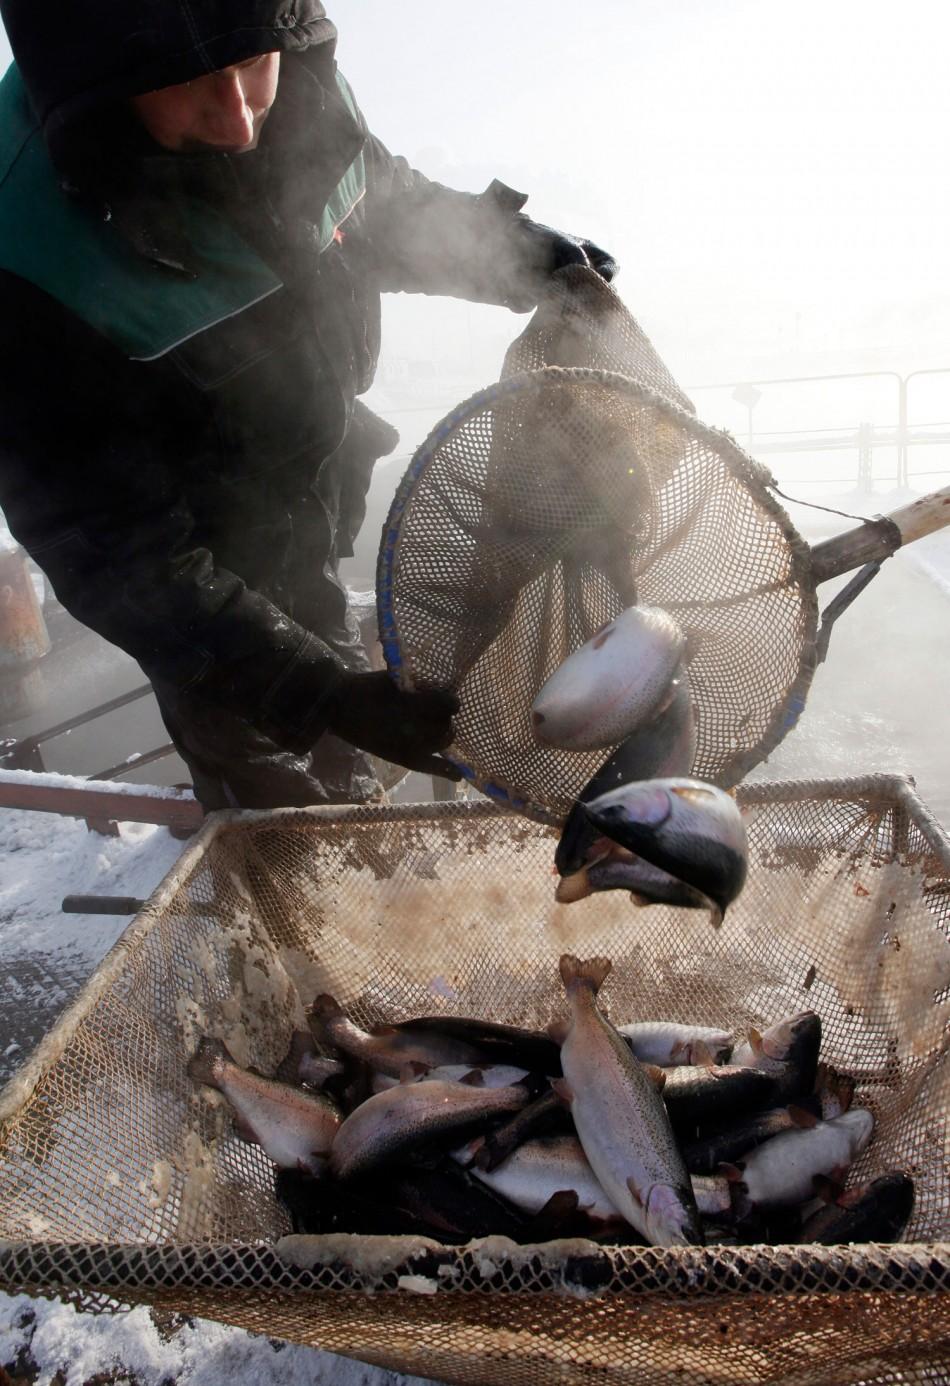 Overfishing of EU Stocks Cost 3.2 Billion Euros and 100000 Jobs